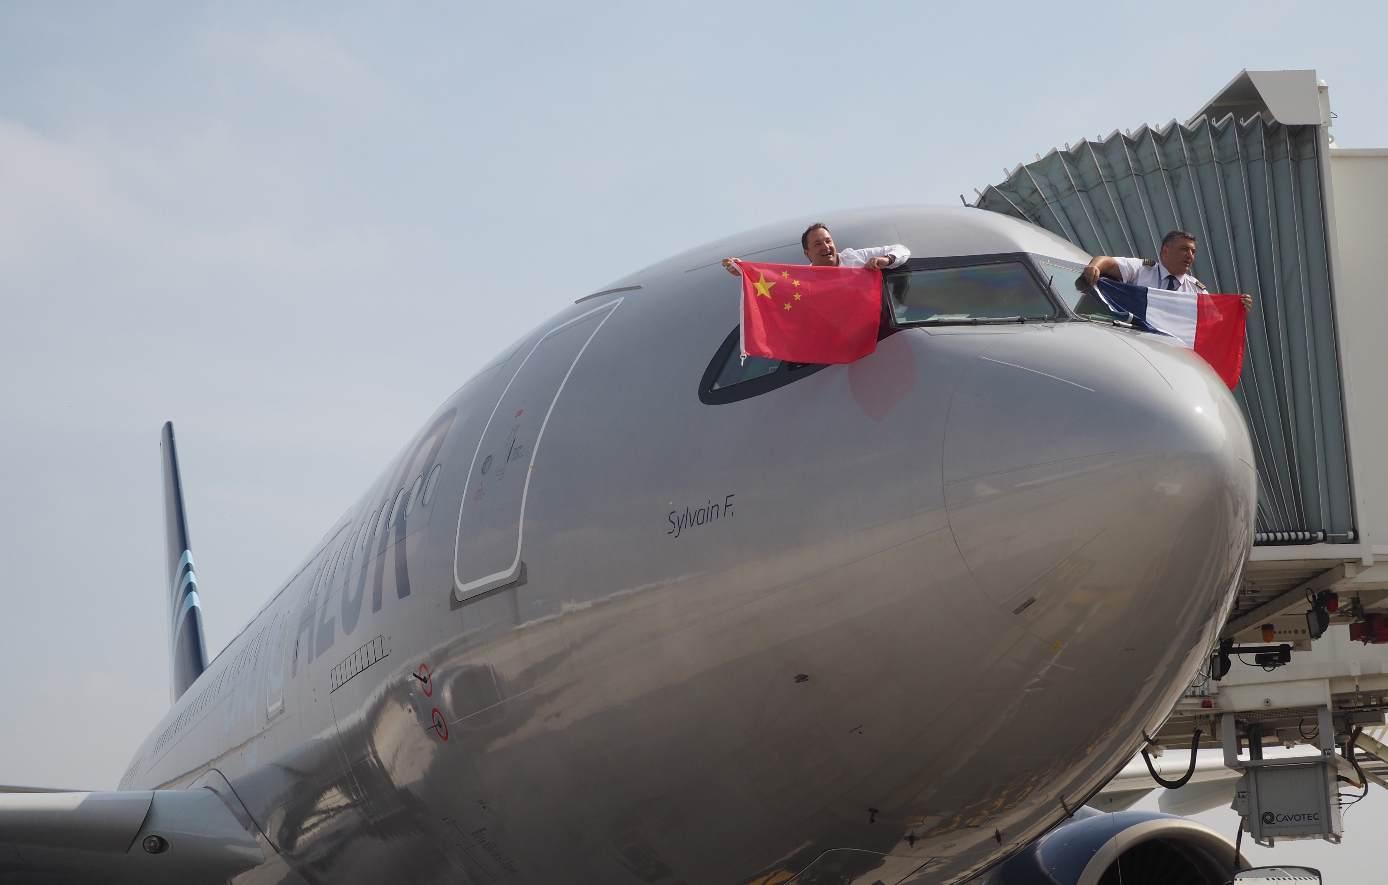 Aigle Azur inaugurates flights to China